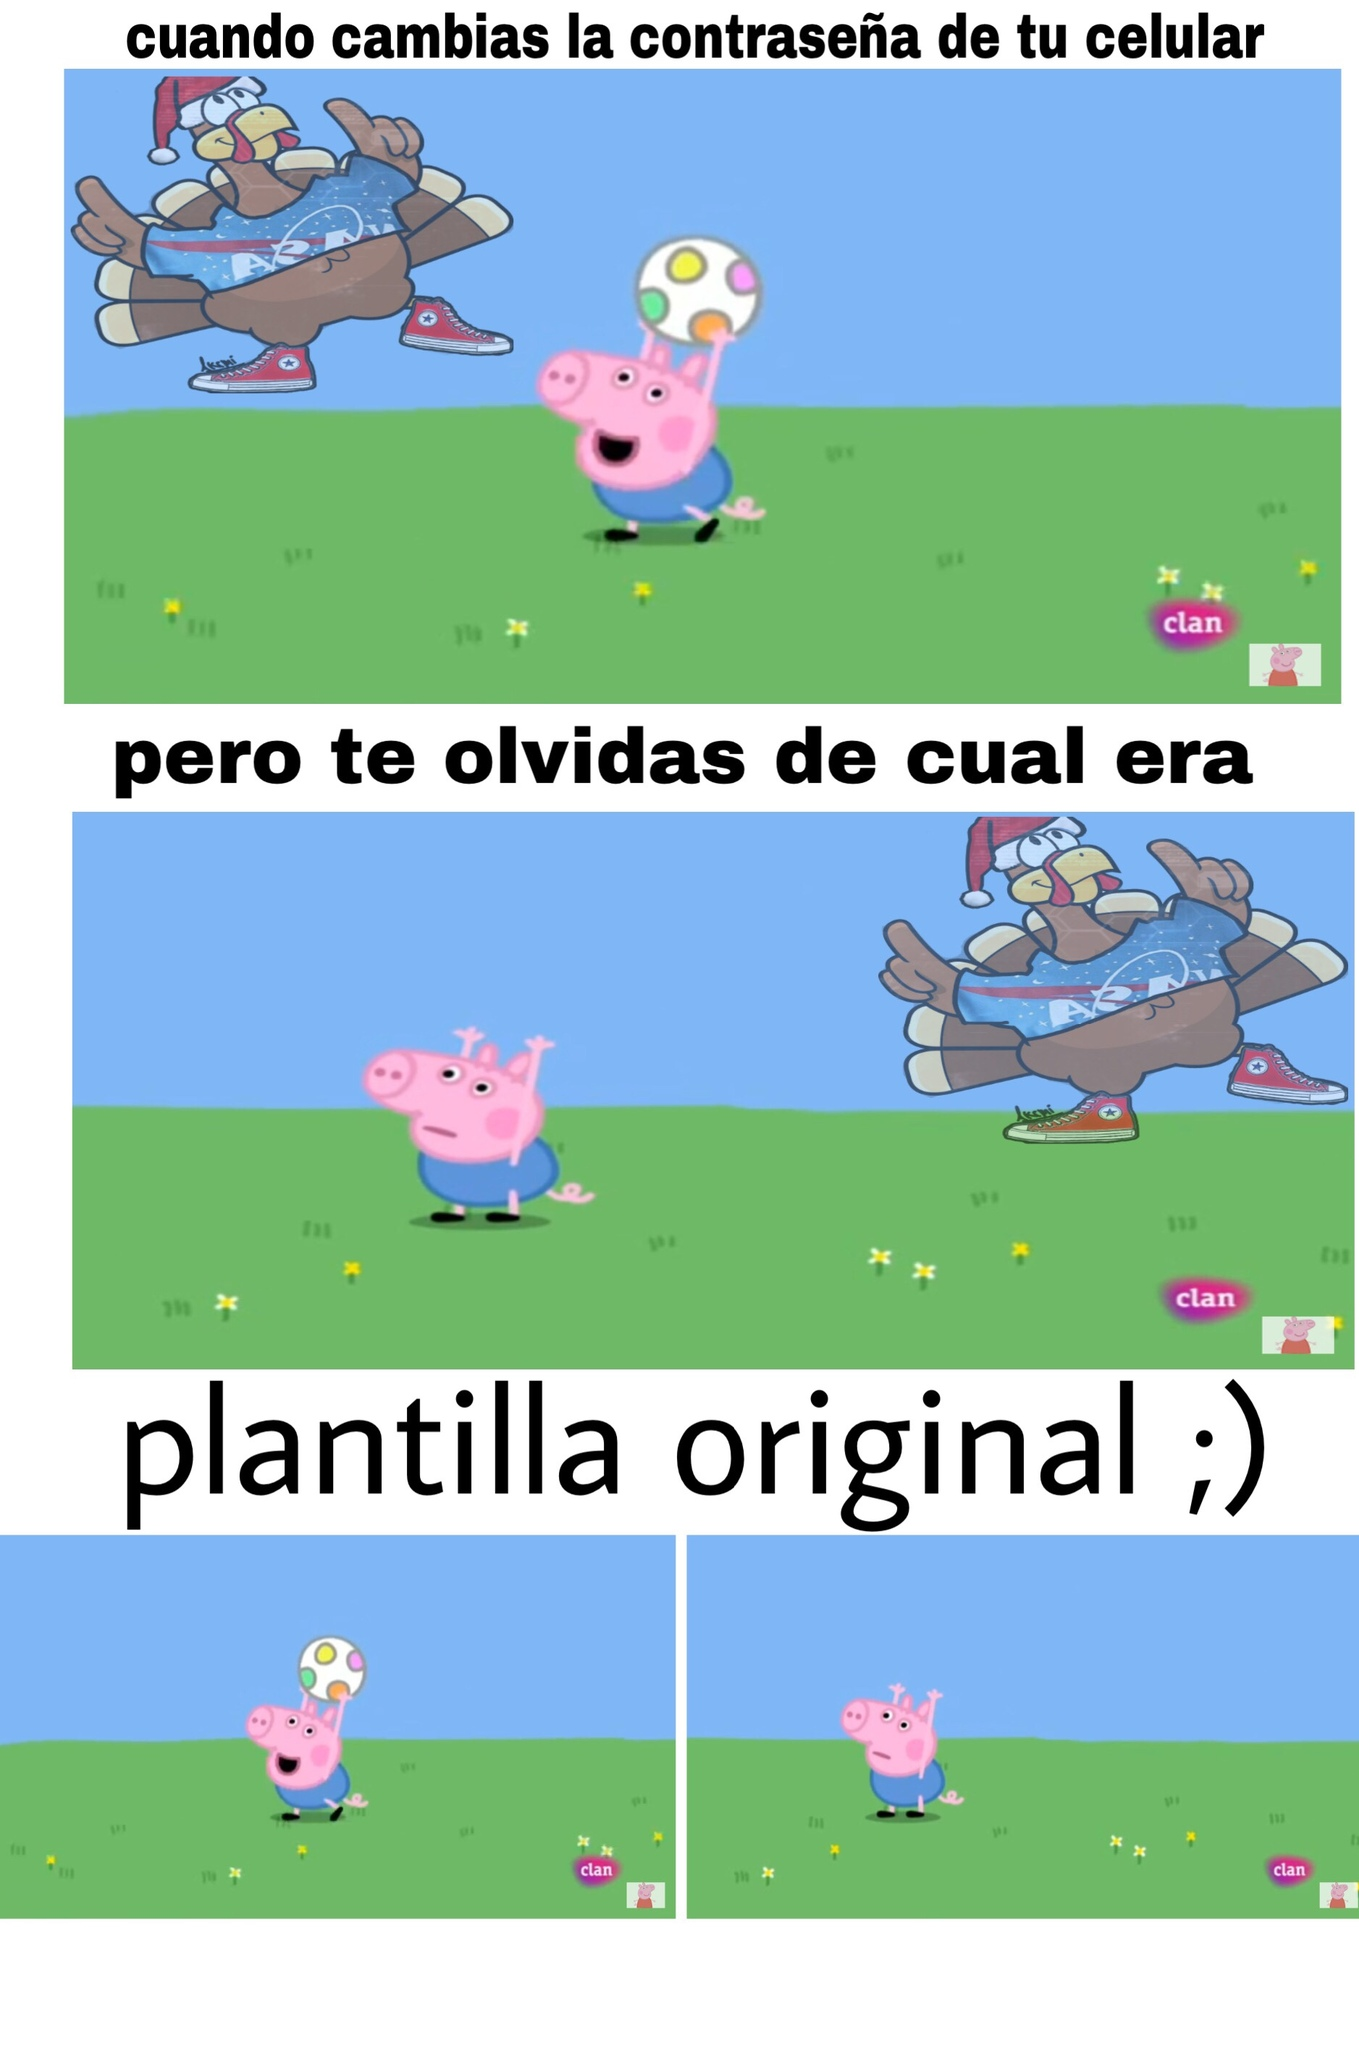 plantilla original gratis<:) - meme